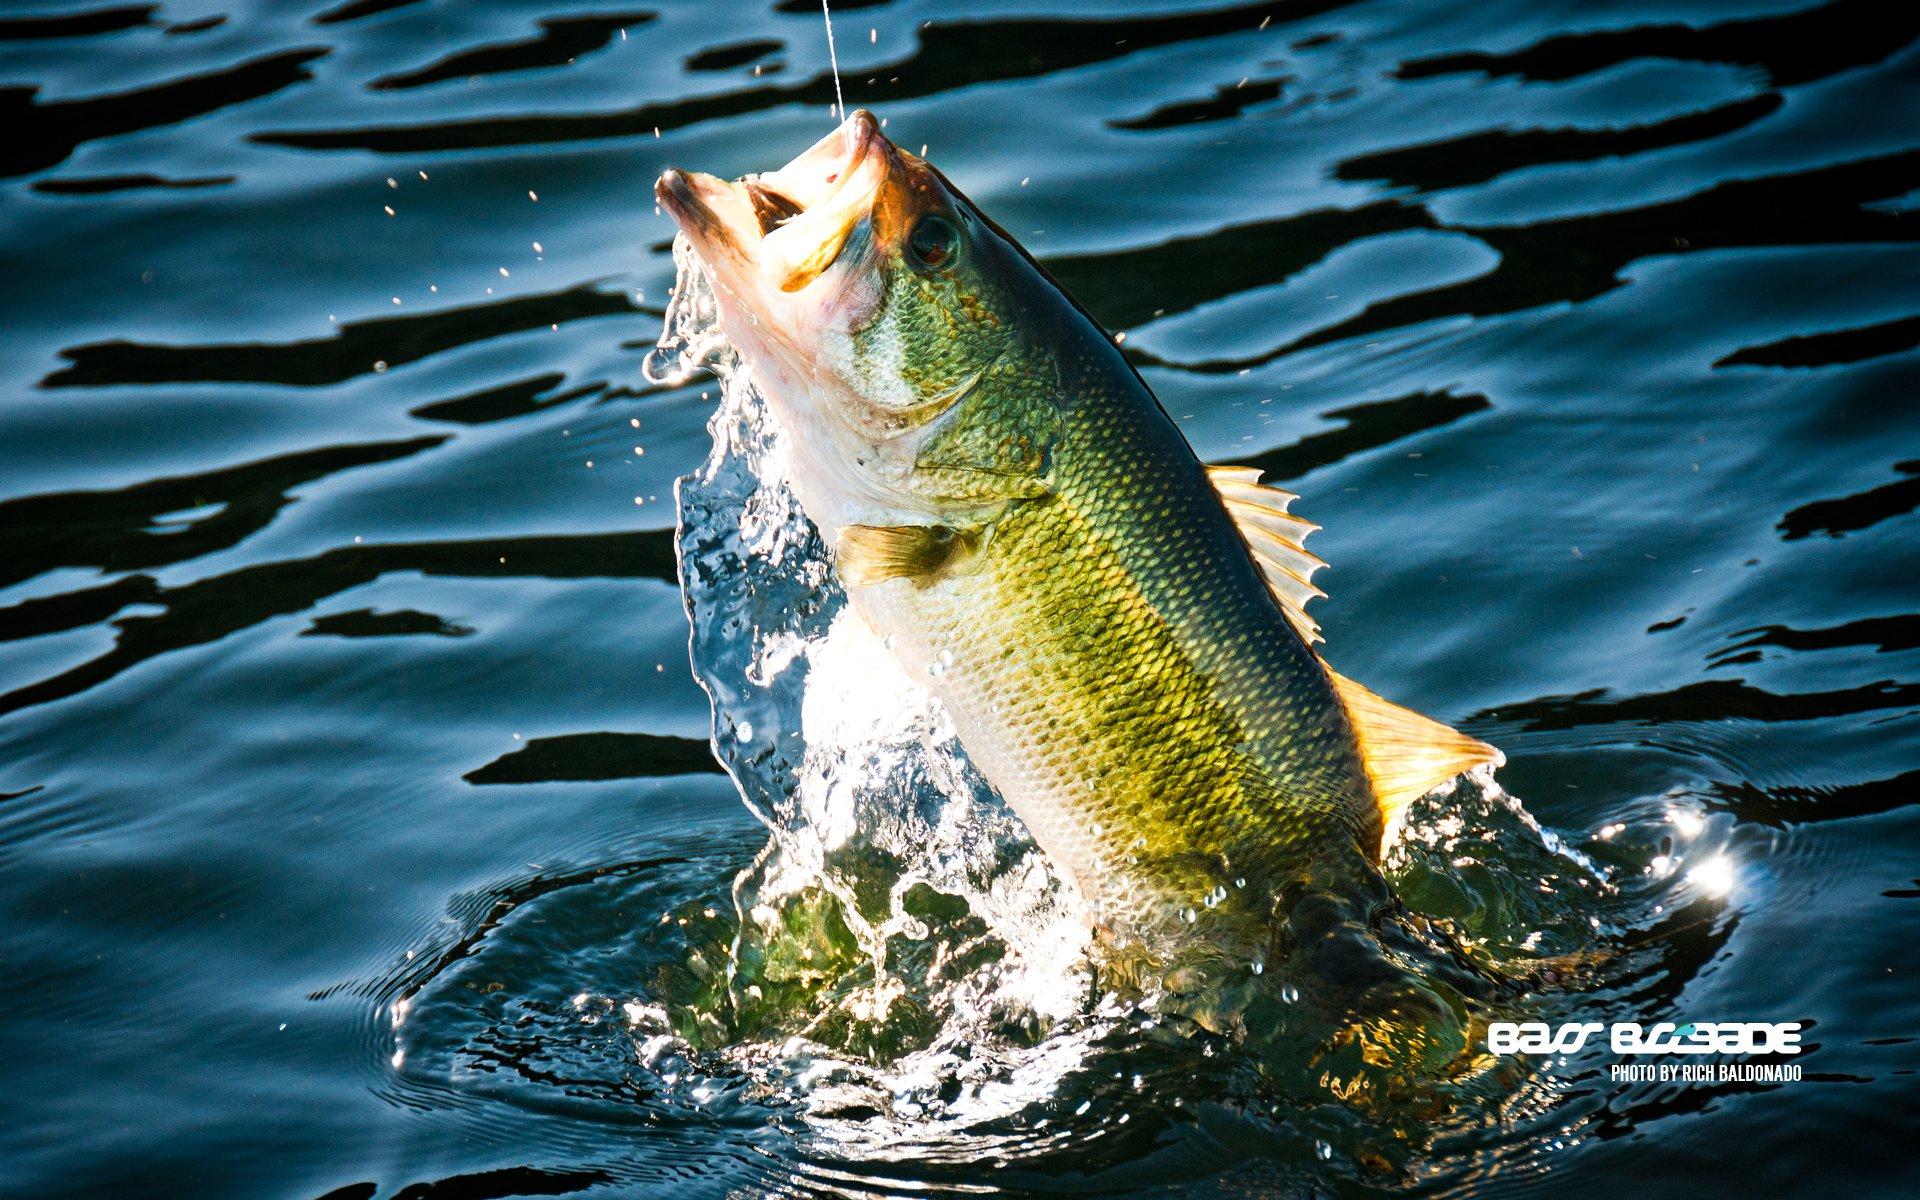 FISHING fish sport water fishes lake river bass wallpaper 1920x1200 1920x1200